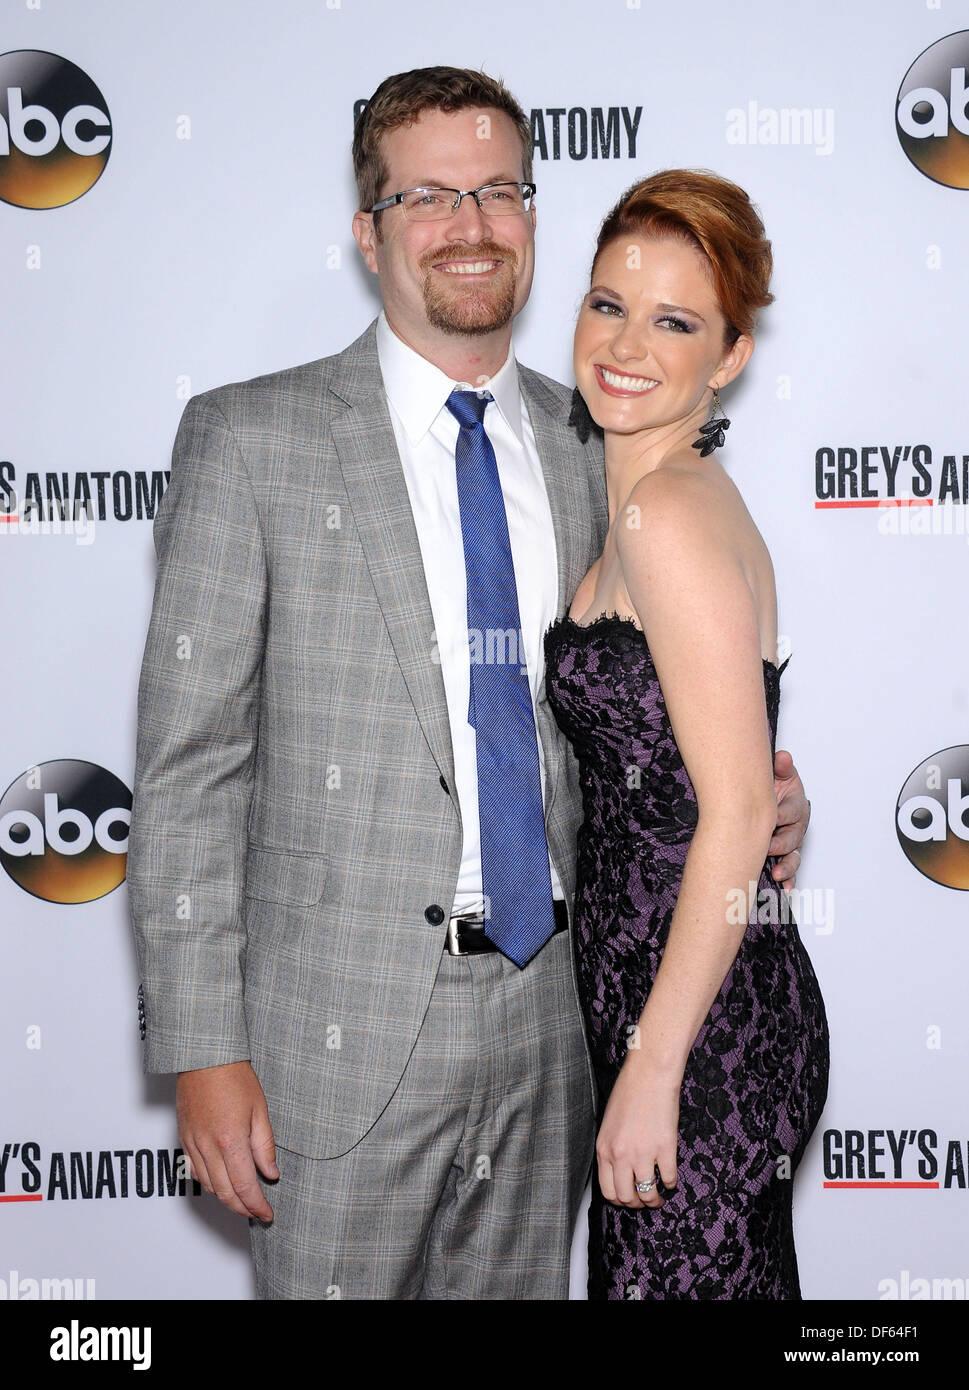 Hollywood, Kalifornien, USA. 28. September 2013. Sarah Drew & Peter ...